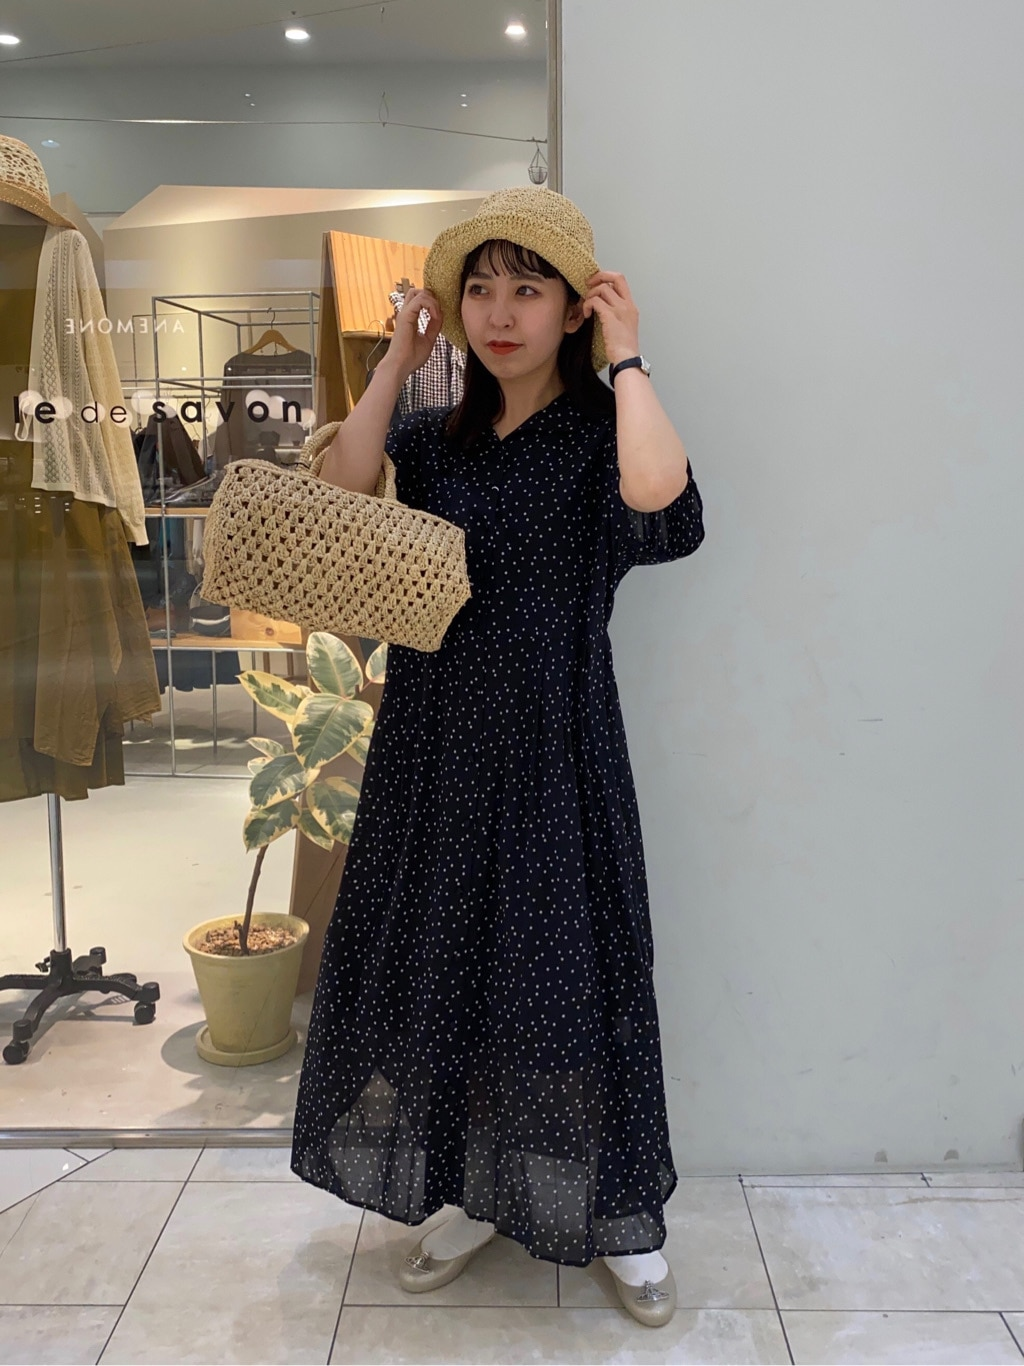 bulle de savon 阪急西宮ガーデンズ 身長:150cm 2020.06.11